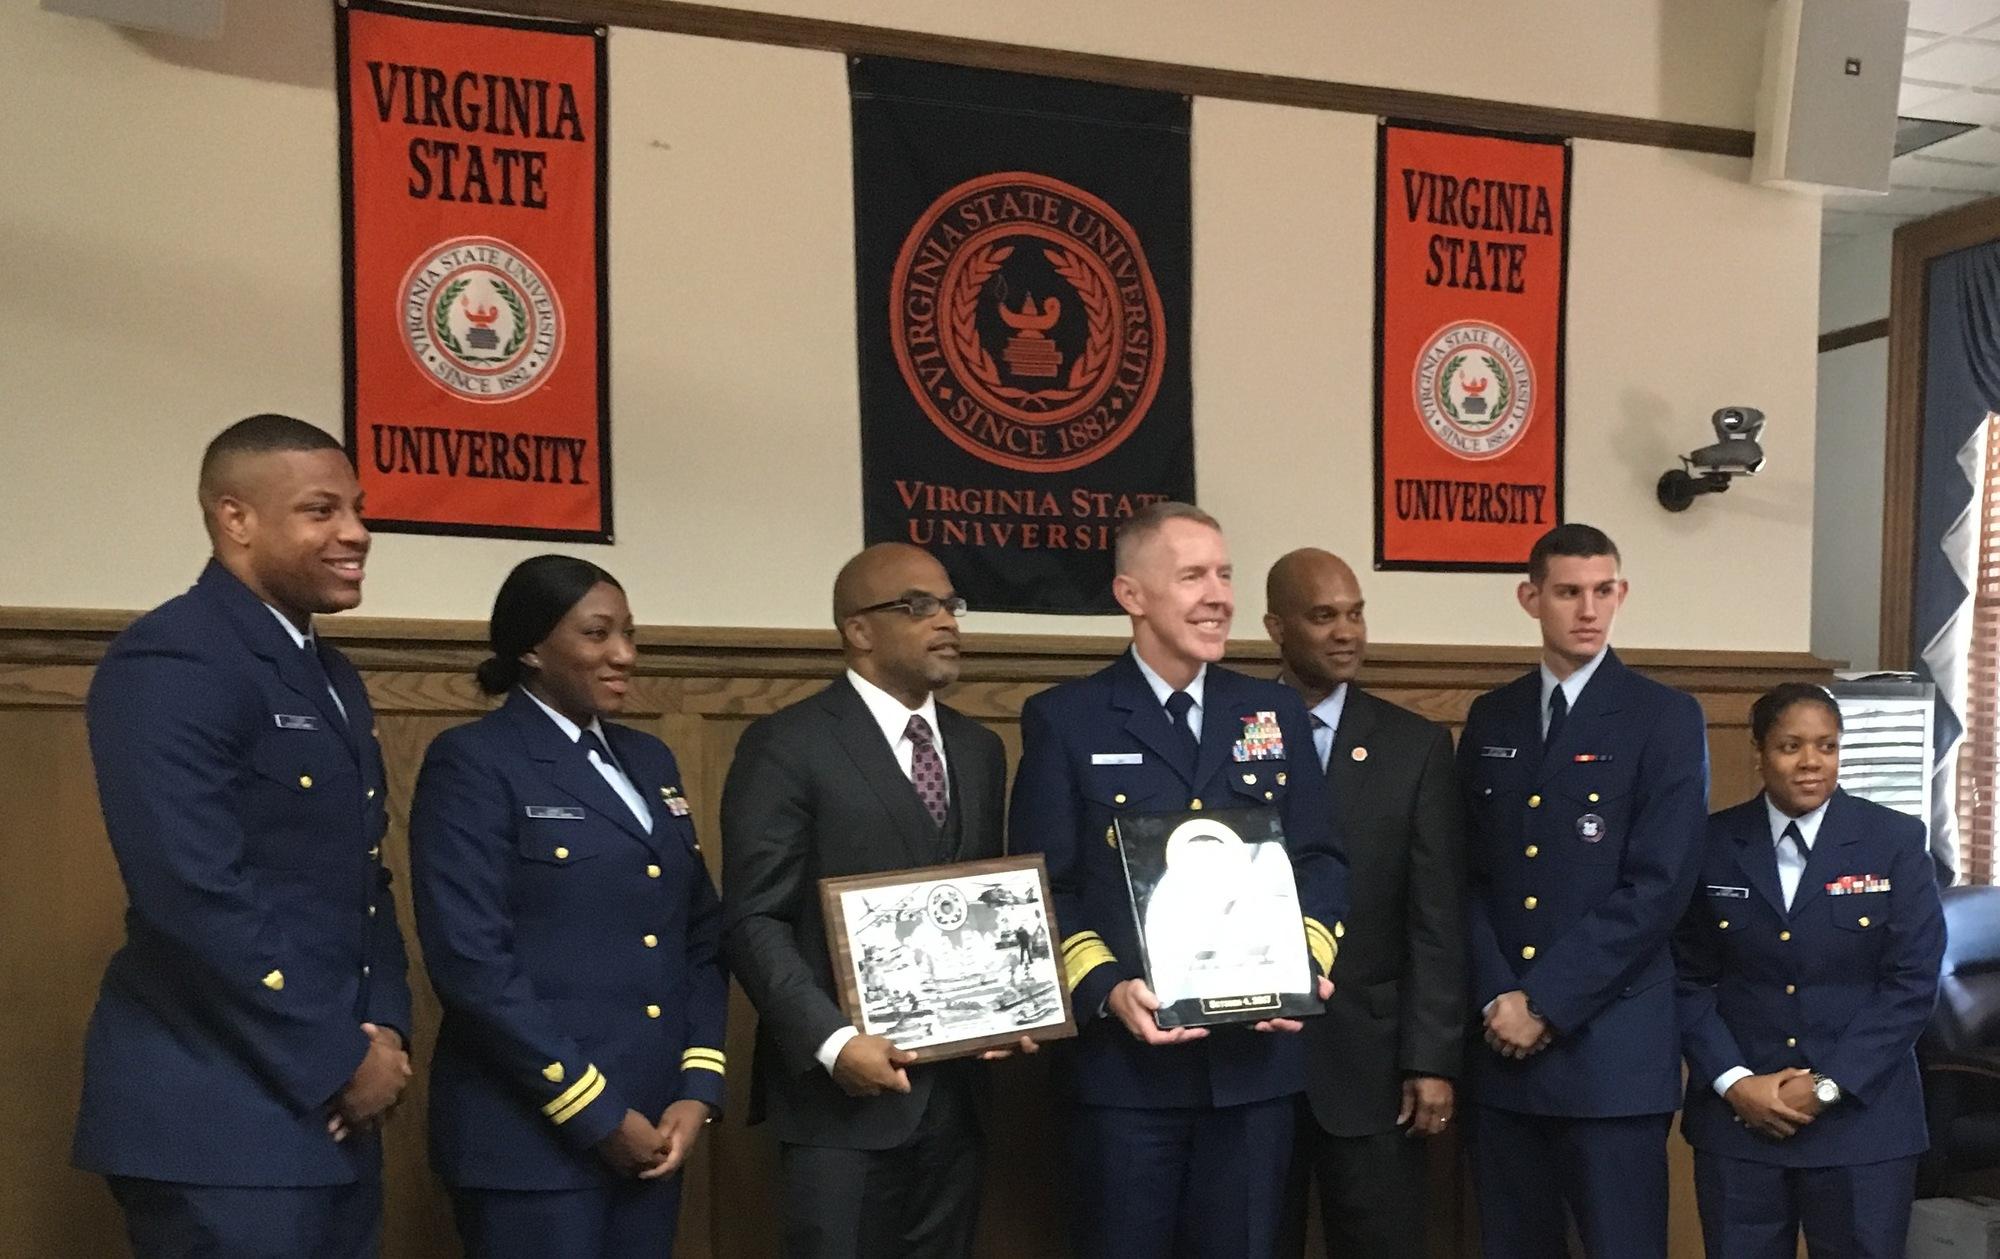 U.S. Coast Guard signs memorandum of agreement with Virginia State University as part of Minority-Serving Insititutions Partnership Program